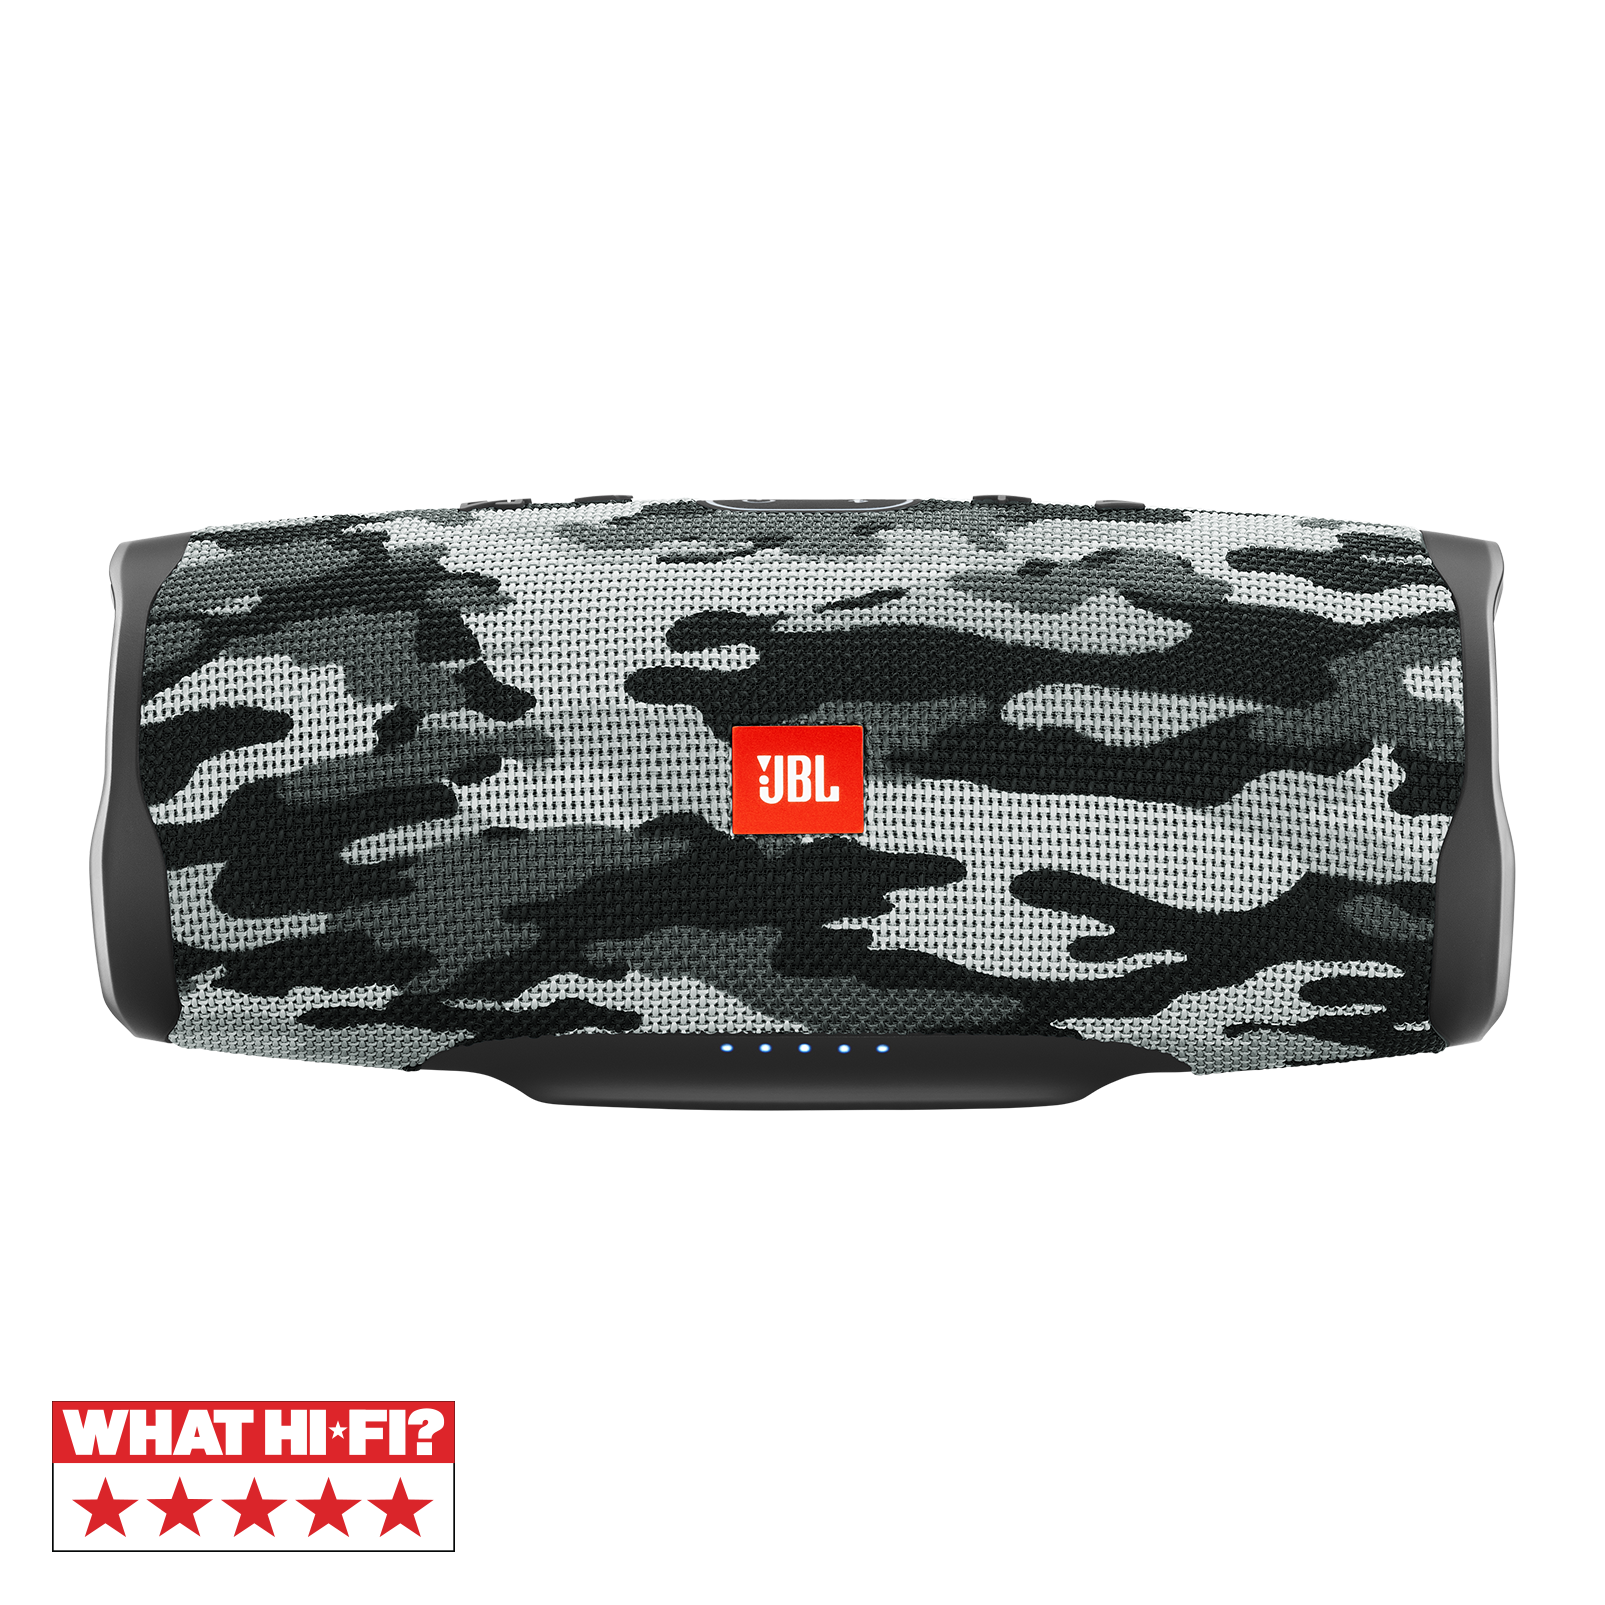 JBL Charge 4 - Black/White Camouflage - Portable Bluetooth speaker - Hero